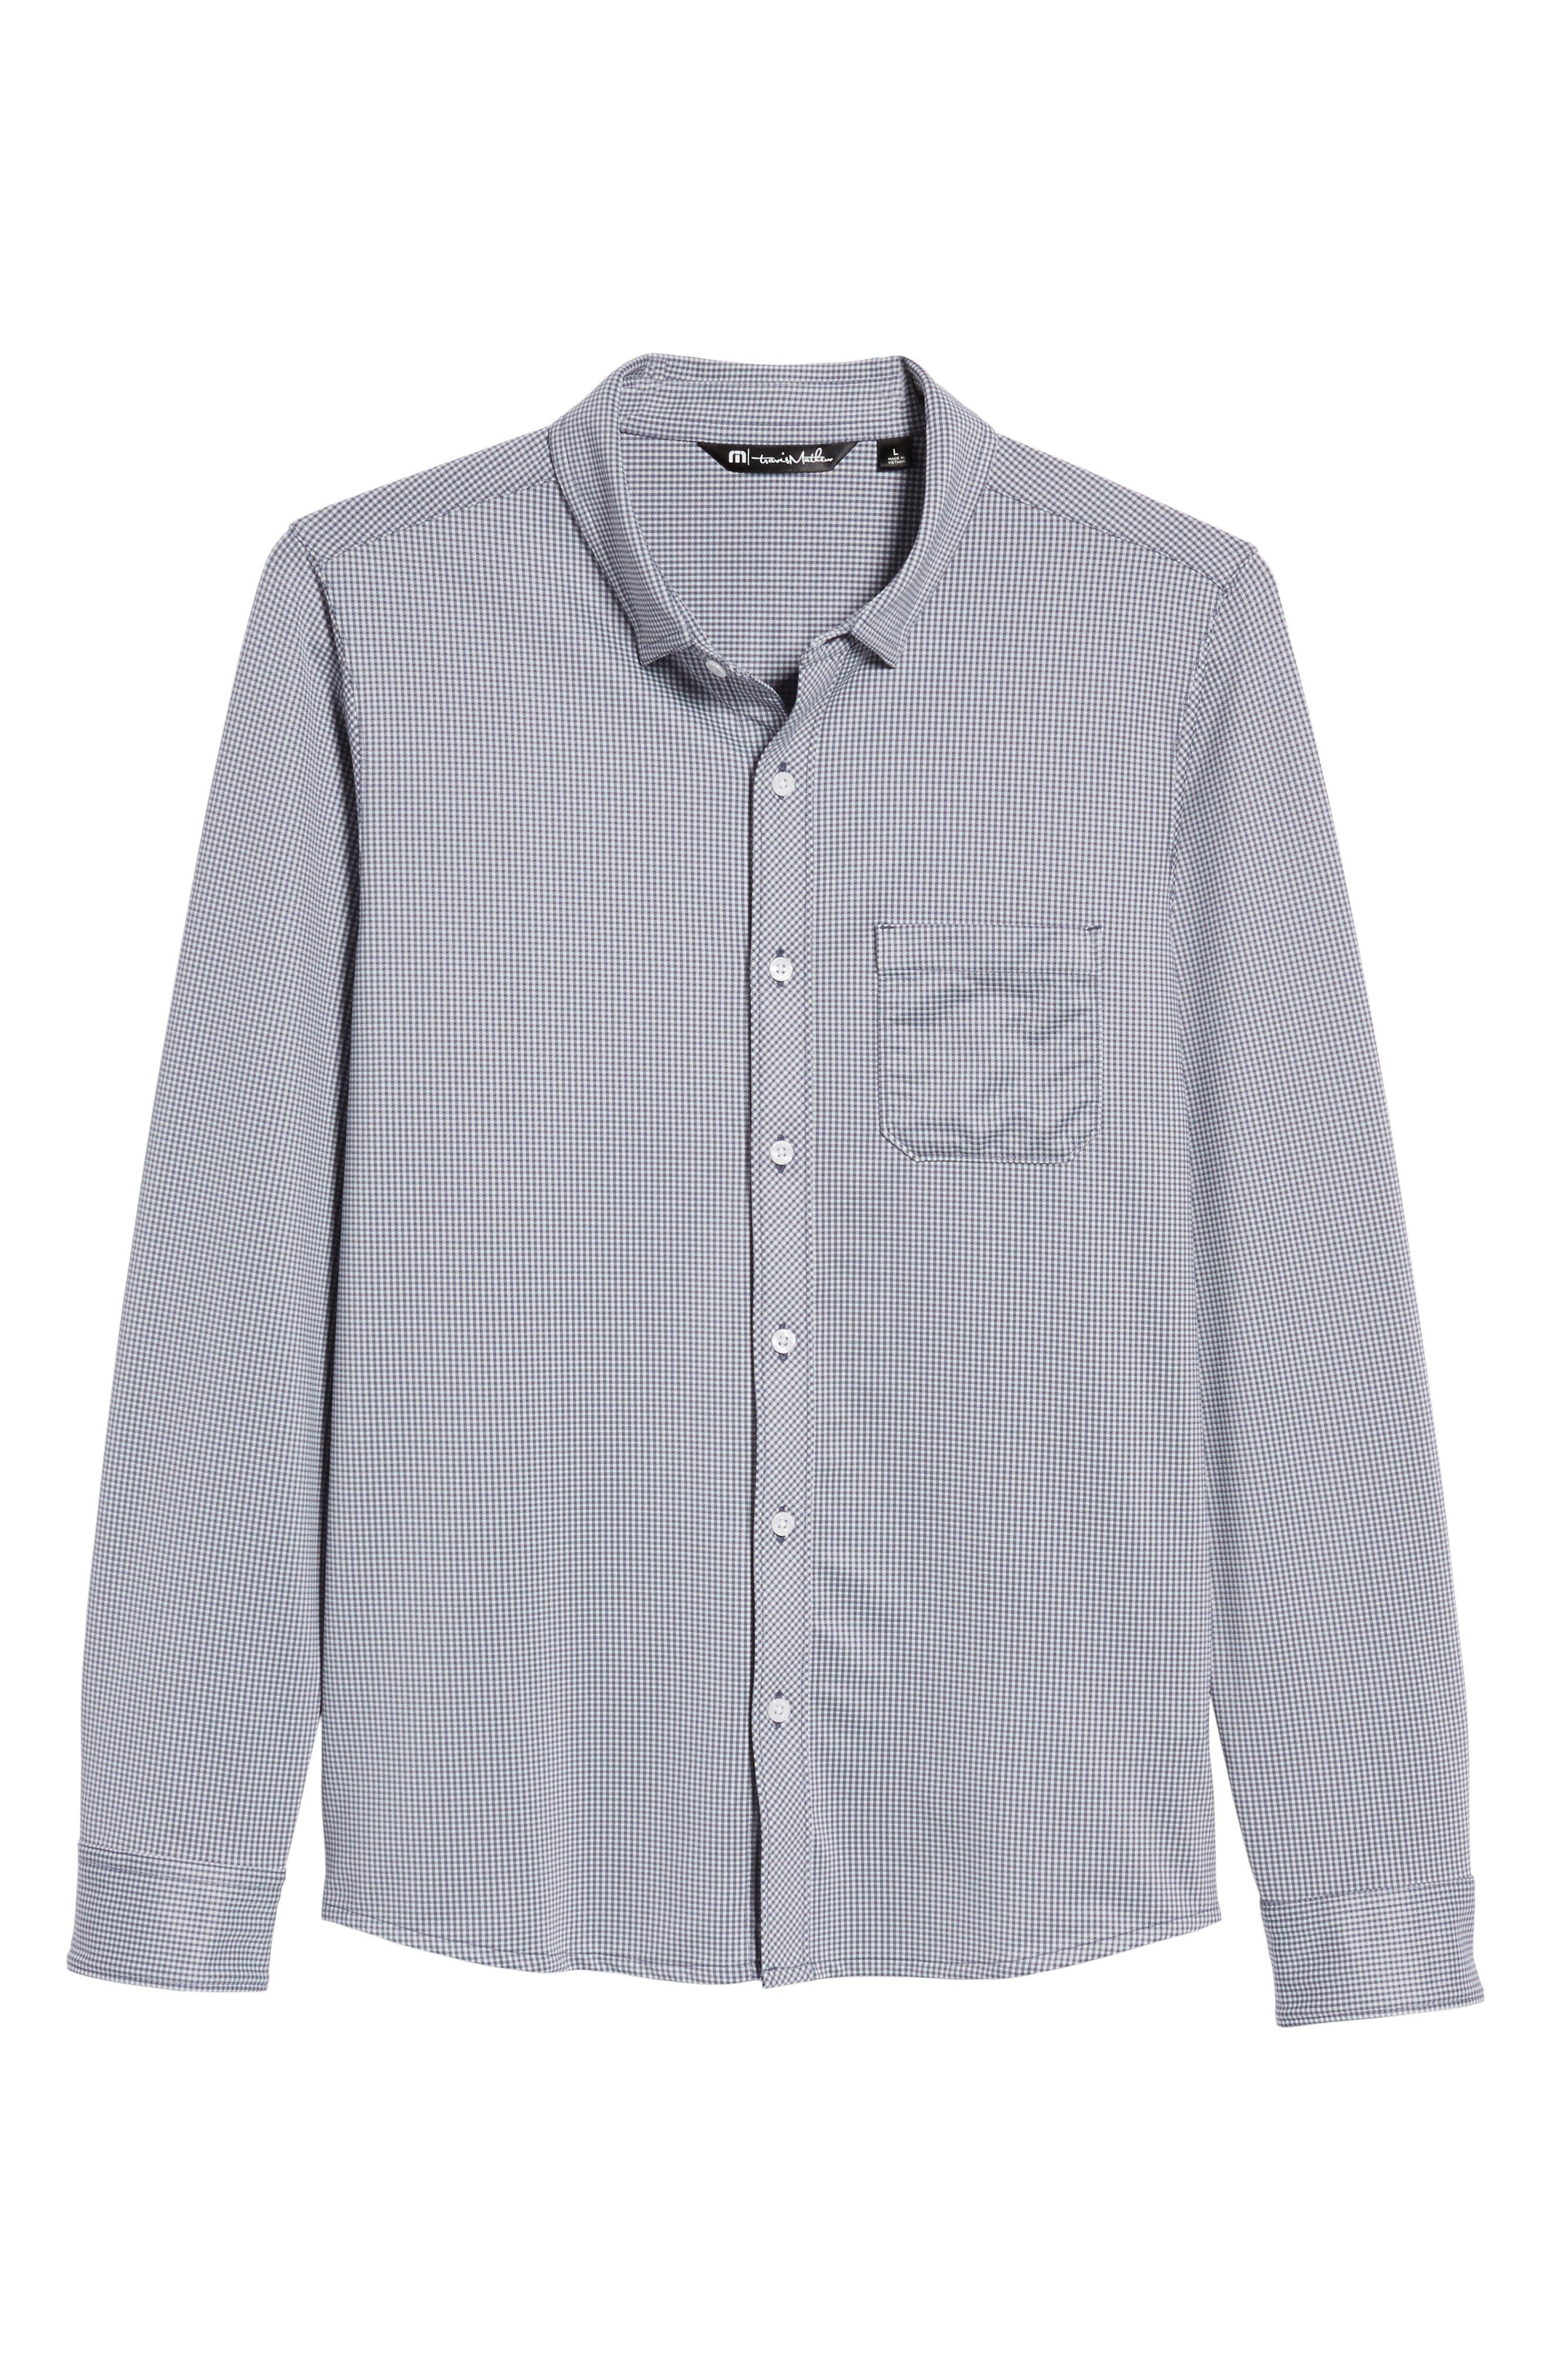 TRAVIS MATHEW,                             Couig Gingham Sport Shirt,                             Alternate thumbnail 6, color,                             105